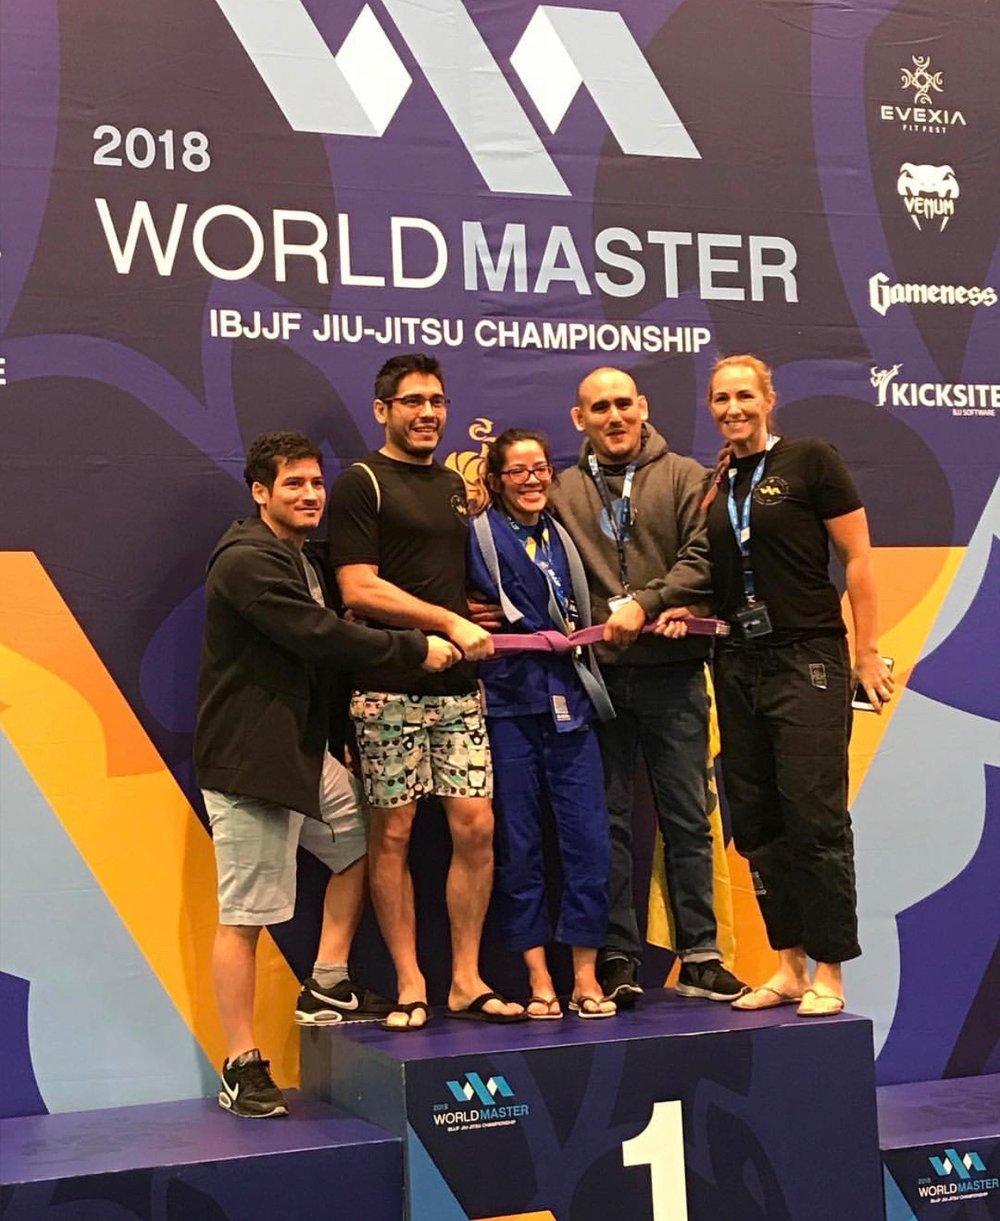 ibjjf world master champion